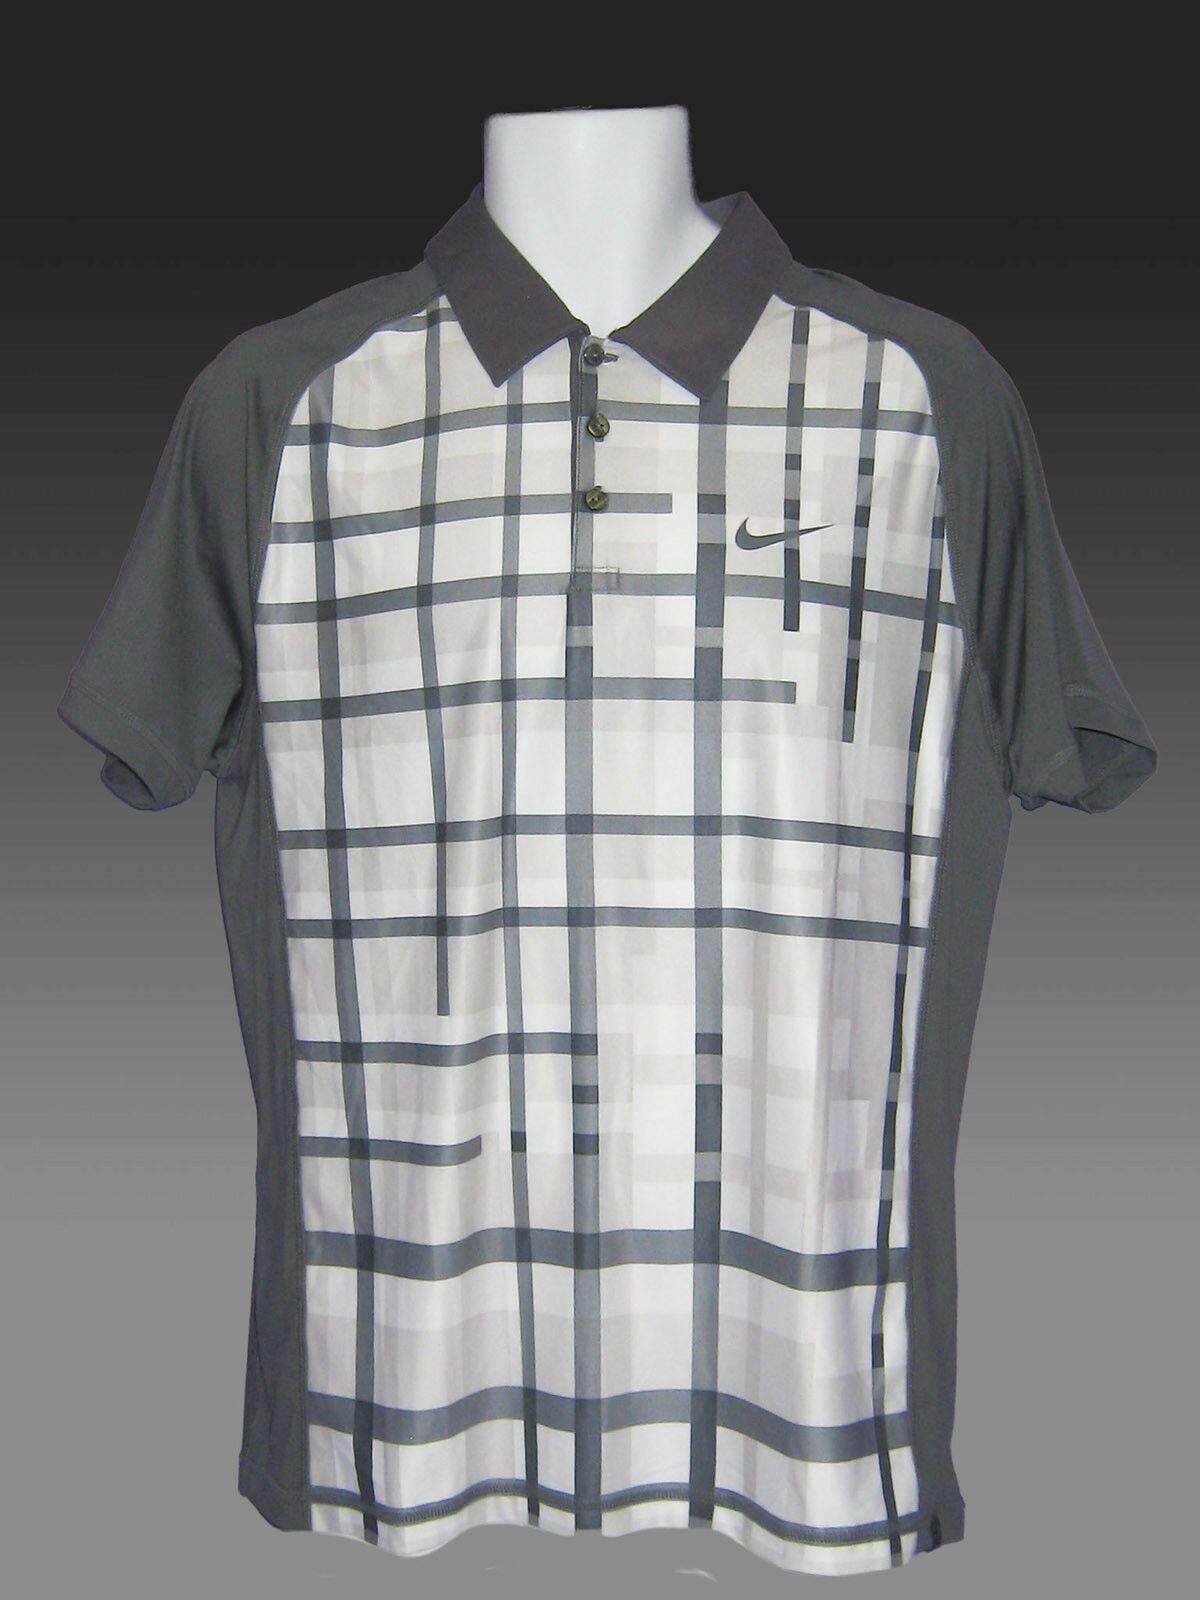 Vintage Nuevo Nike Tenis Drifit Polo gris y blancoo  M  genuina alta calidad